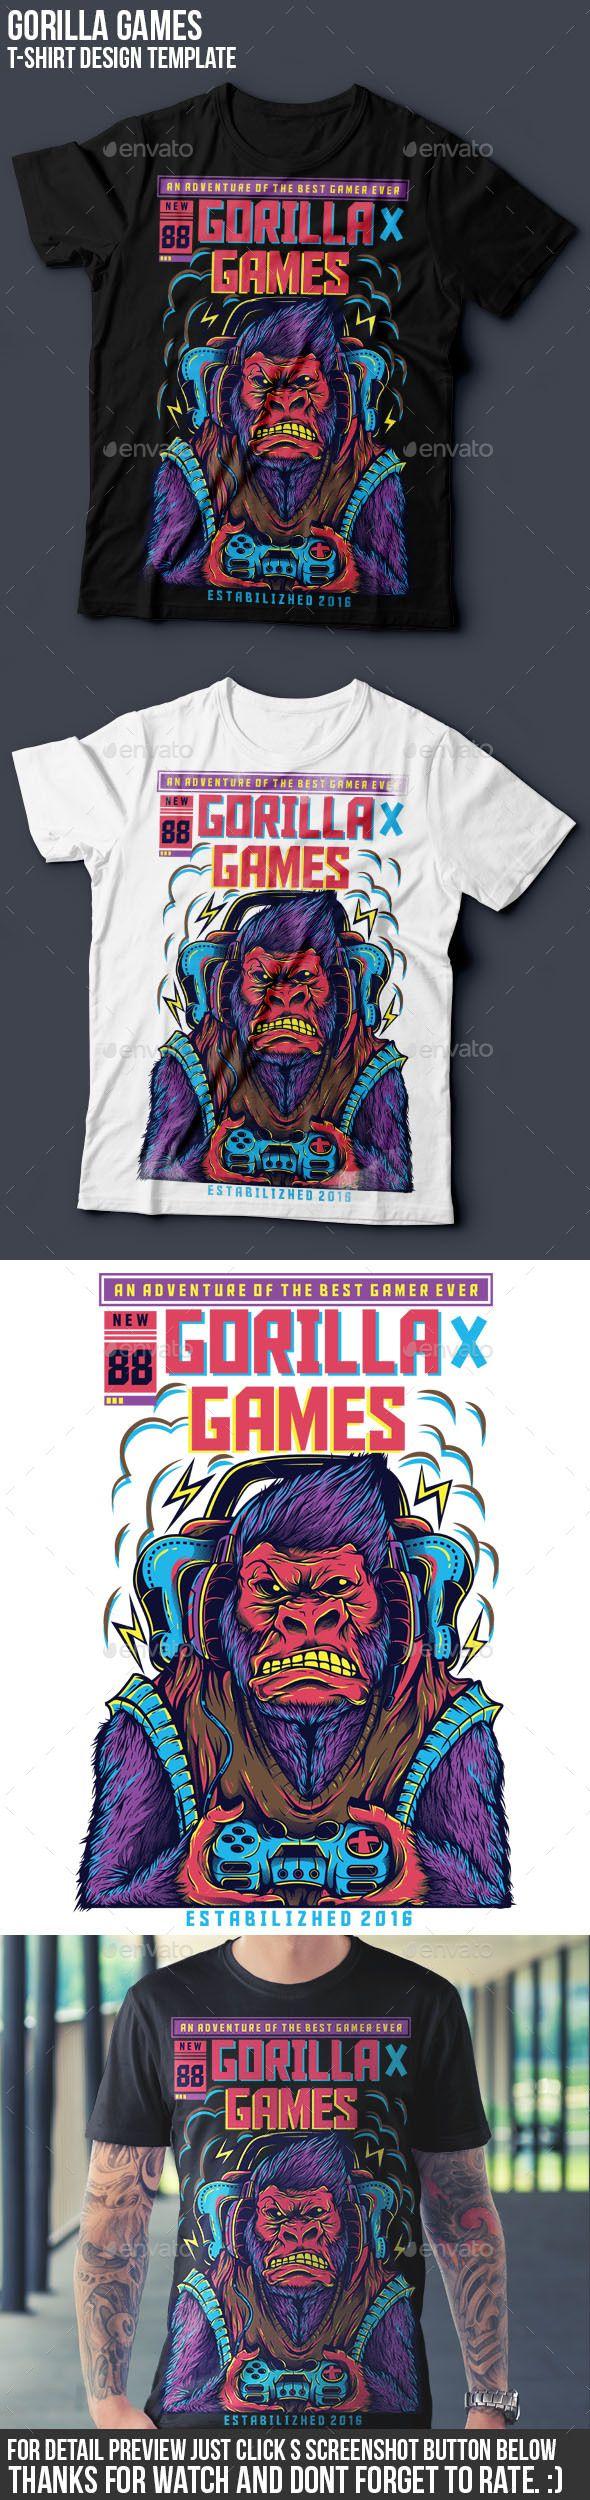 Shirt design games - Gorilla Games Funny Designshirt